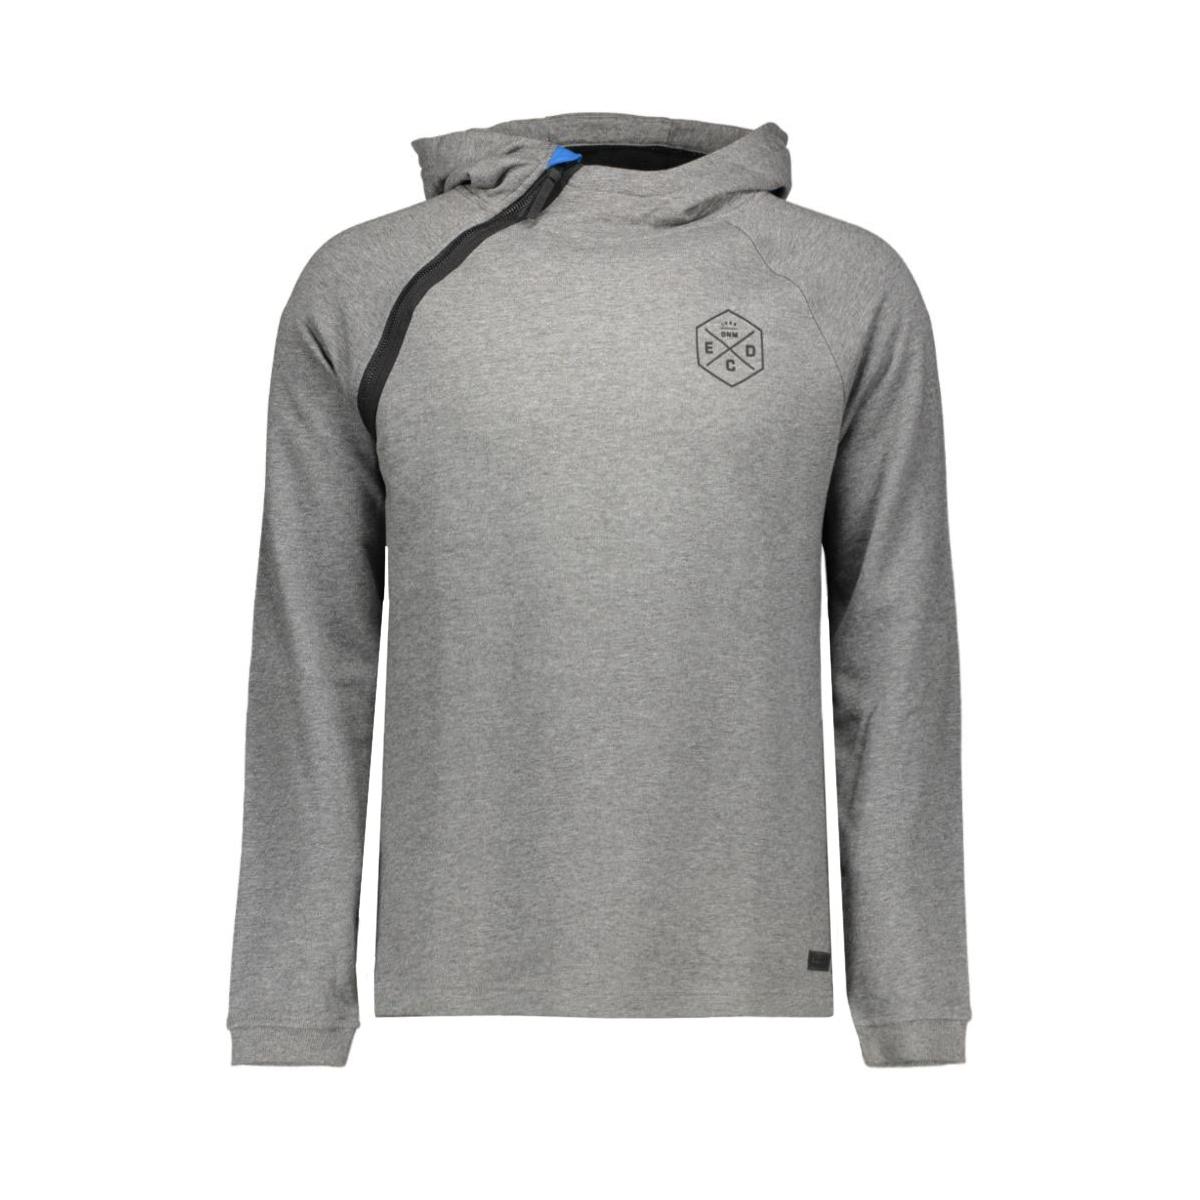 125cc2j004 edc sweater c035